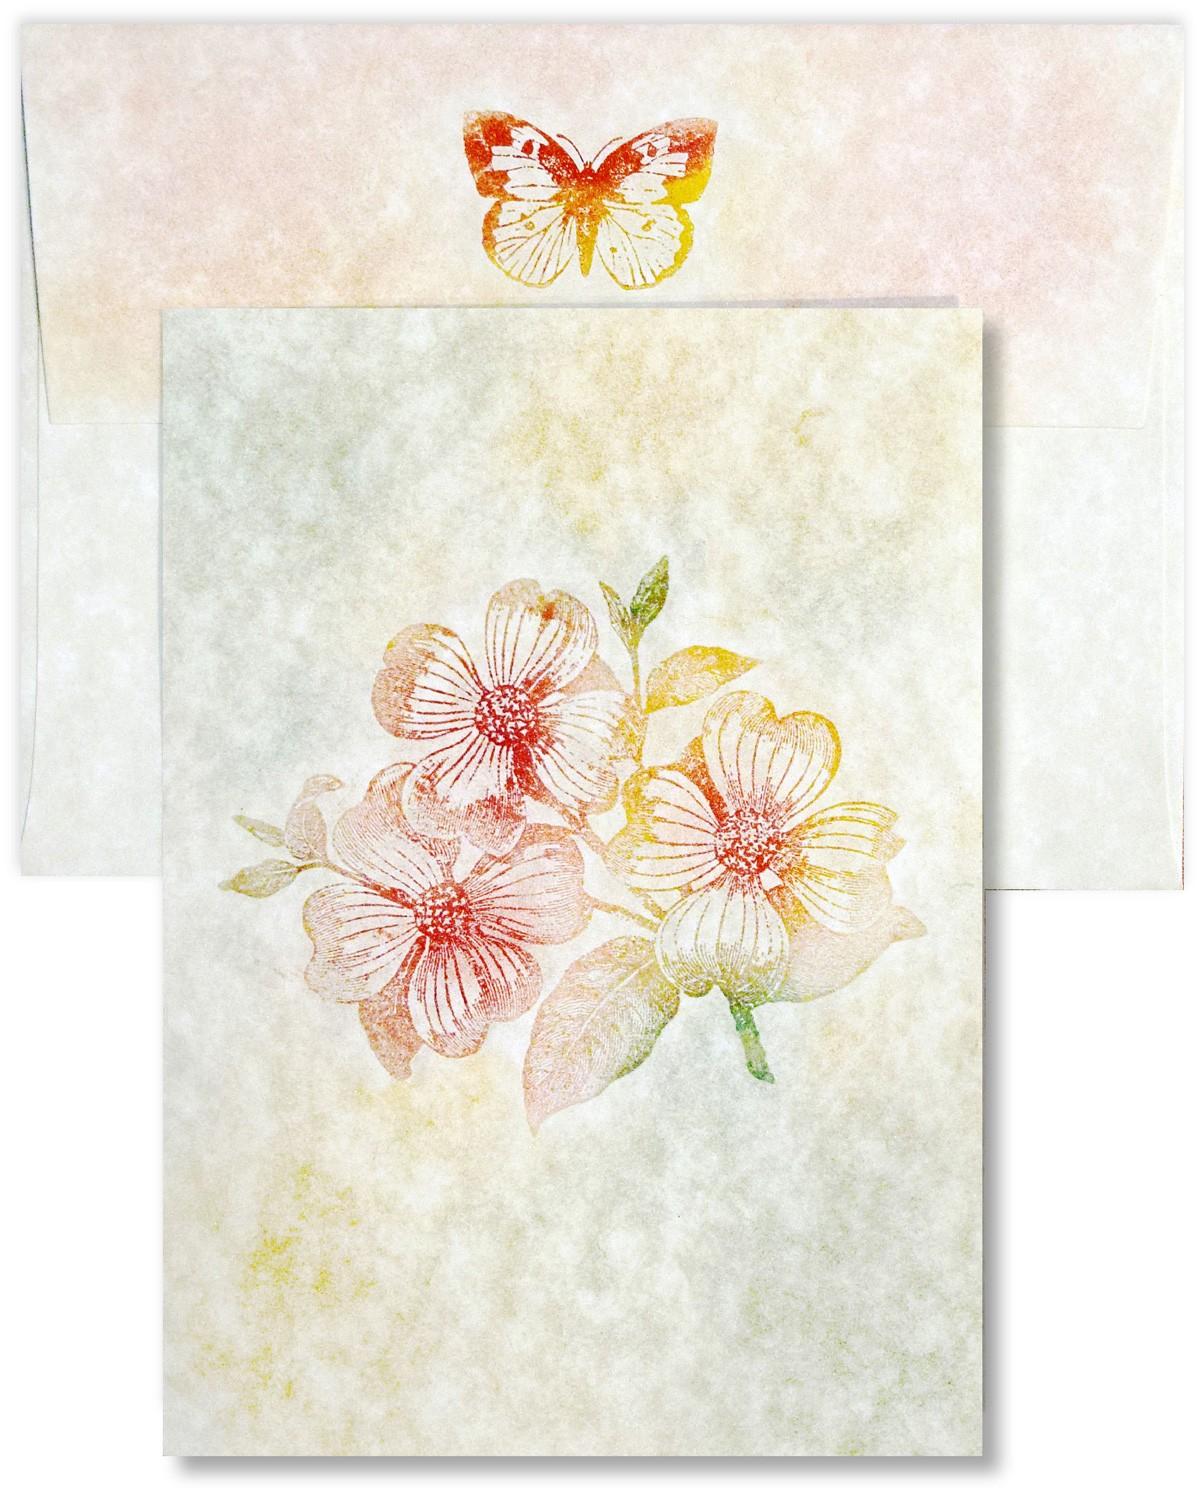 design elegant folded cards with parchment card stock paper - ParchmentCard1 - Design Elegant Folded Cards with Parchment Card Stock Paper